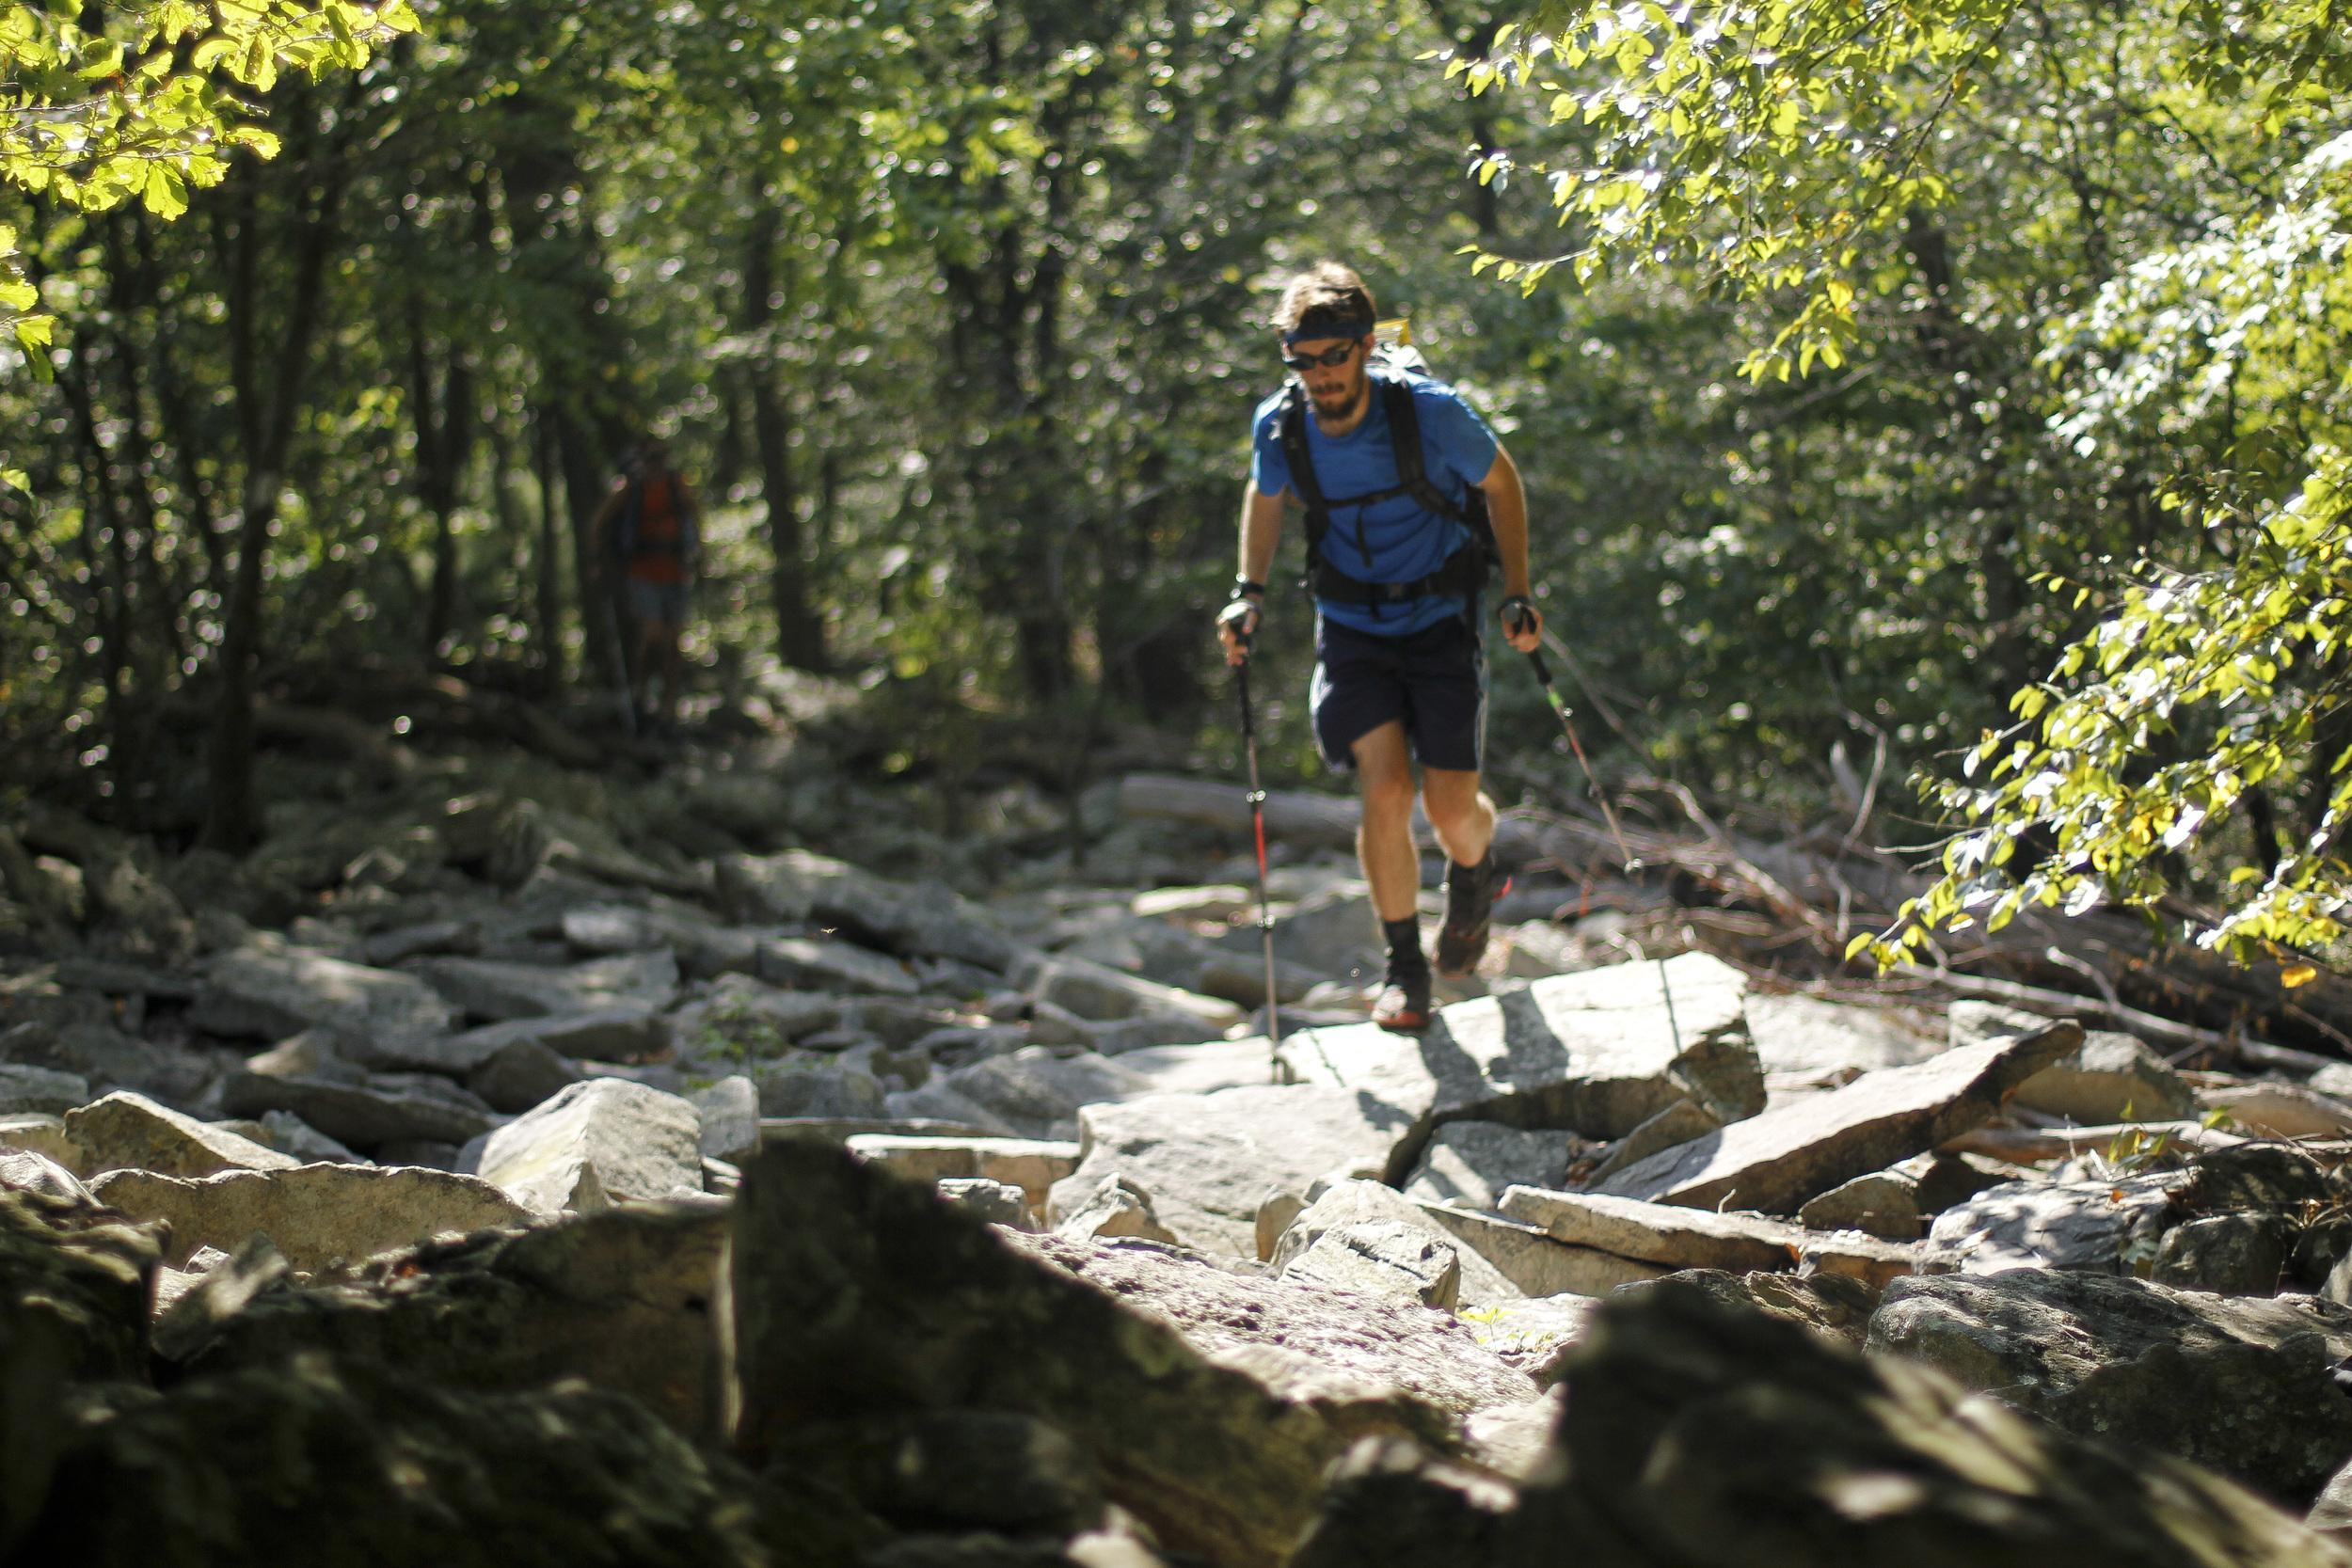 Long John finding his rhythm through the rocky terrain of Pennsylvania.